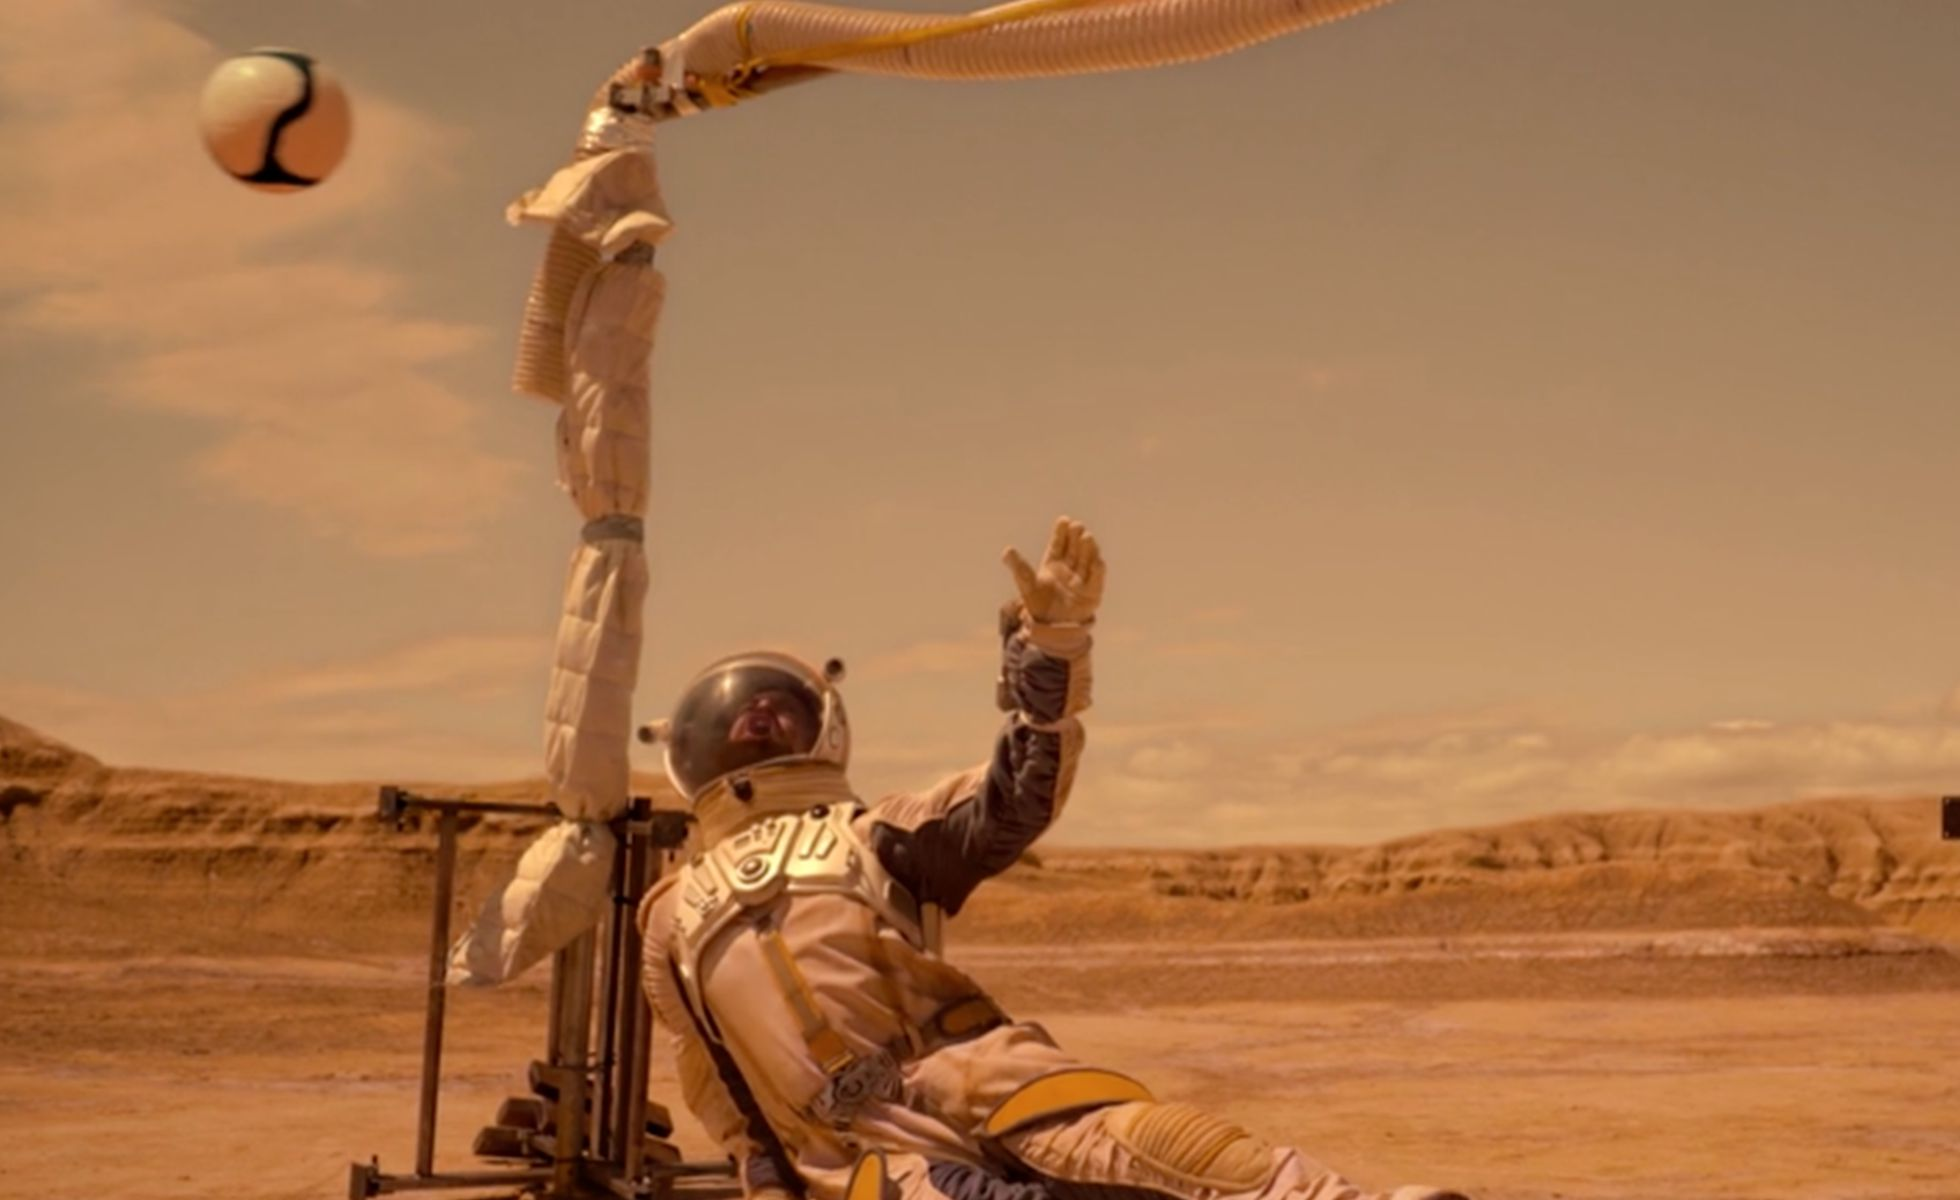 William Hill Astronaut Advert